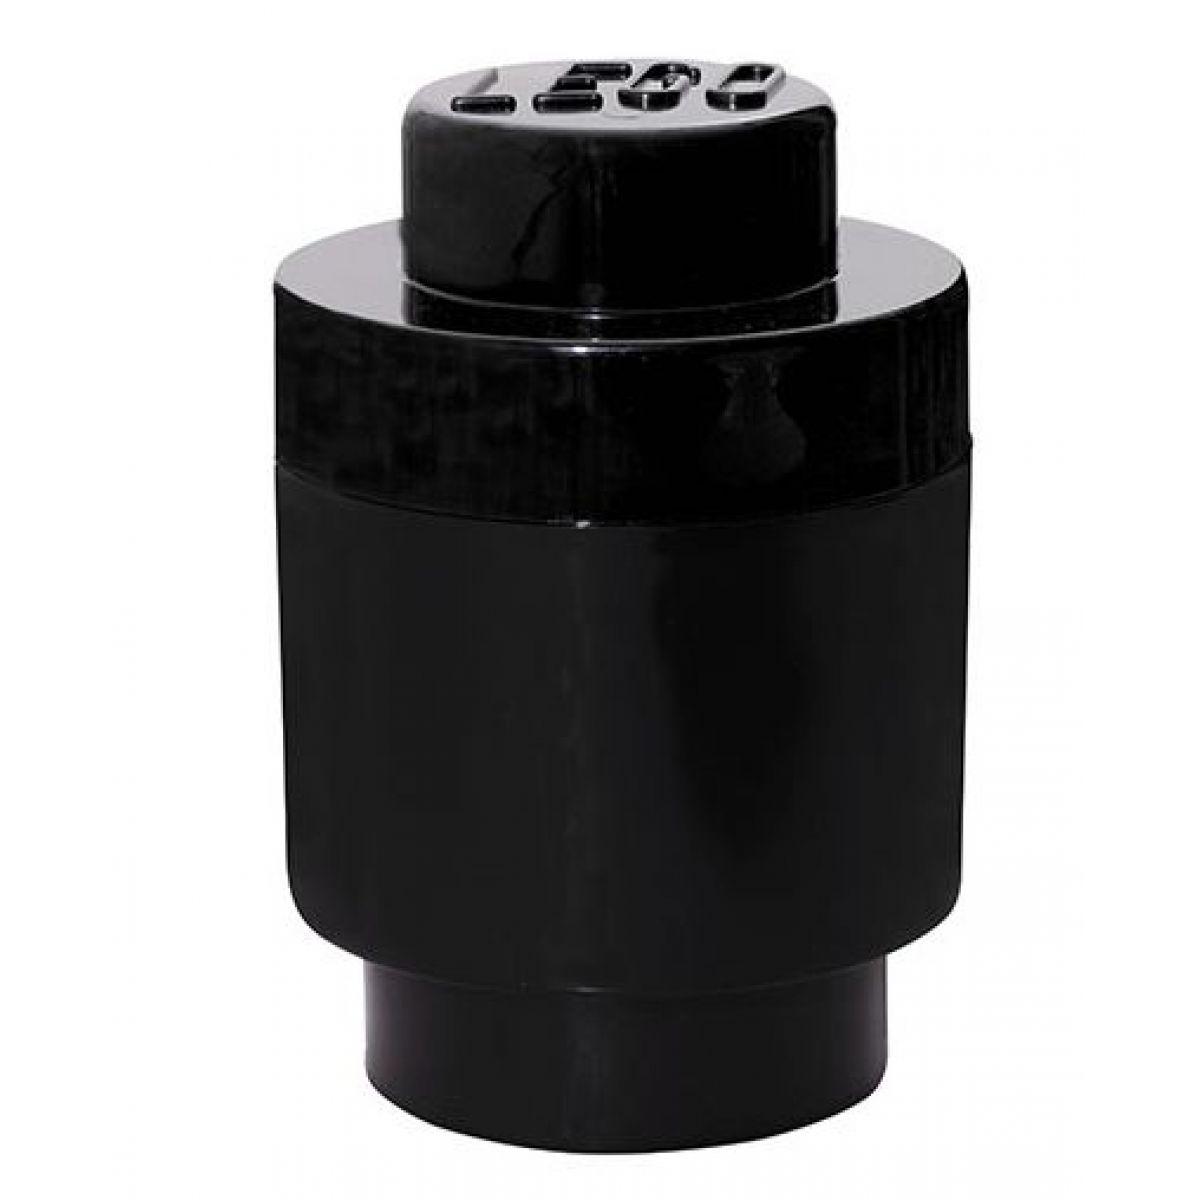 LEGO úložný box guľatý 12,3 x 18,3 cm čierna